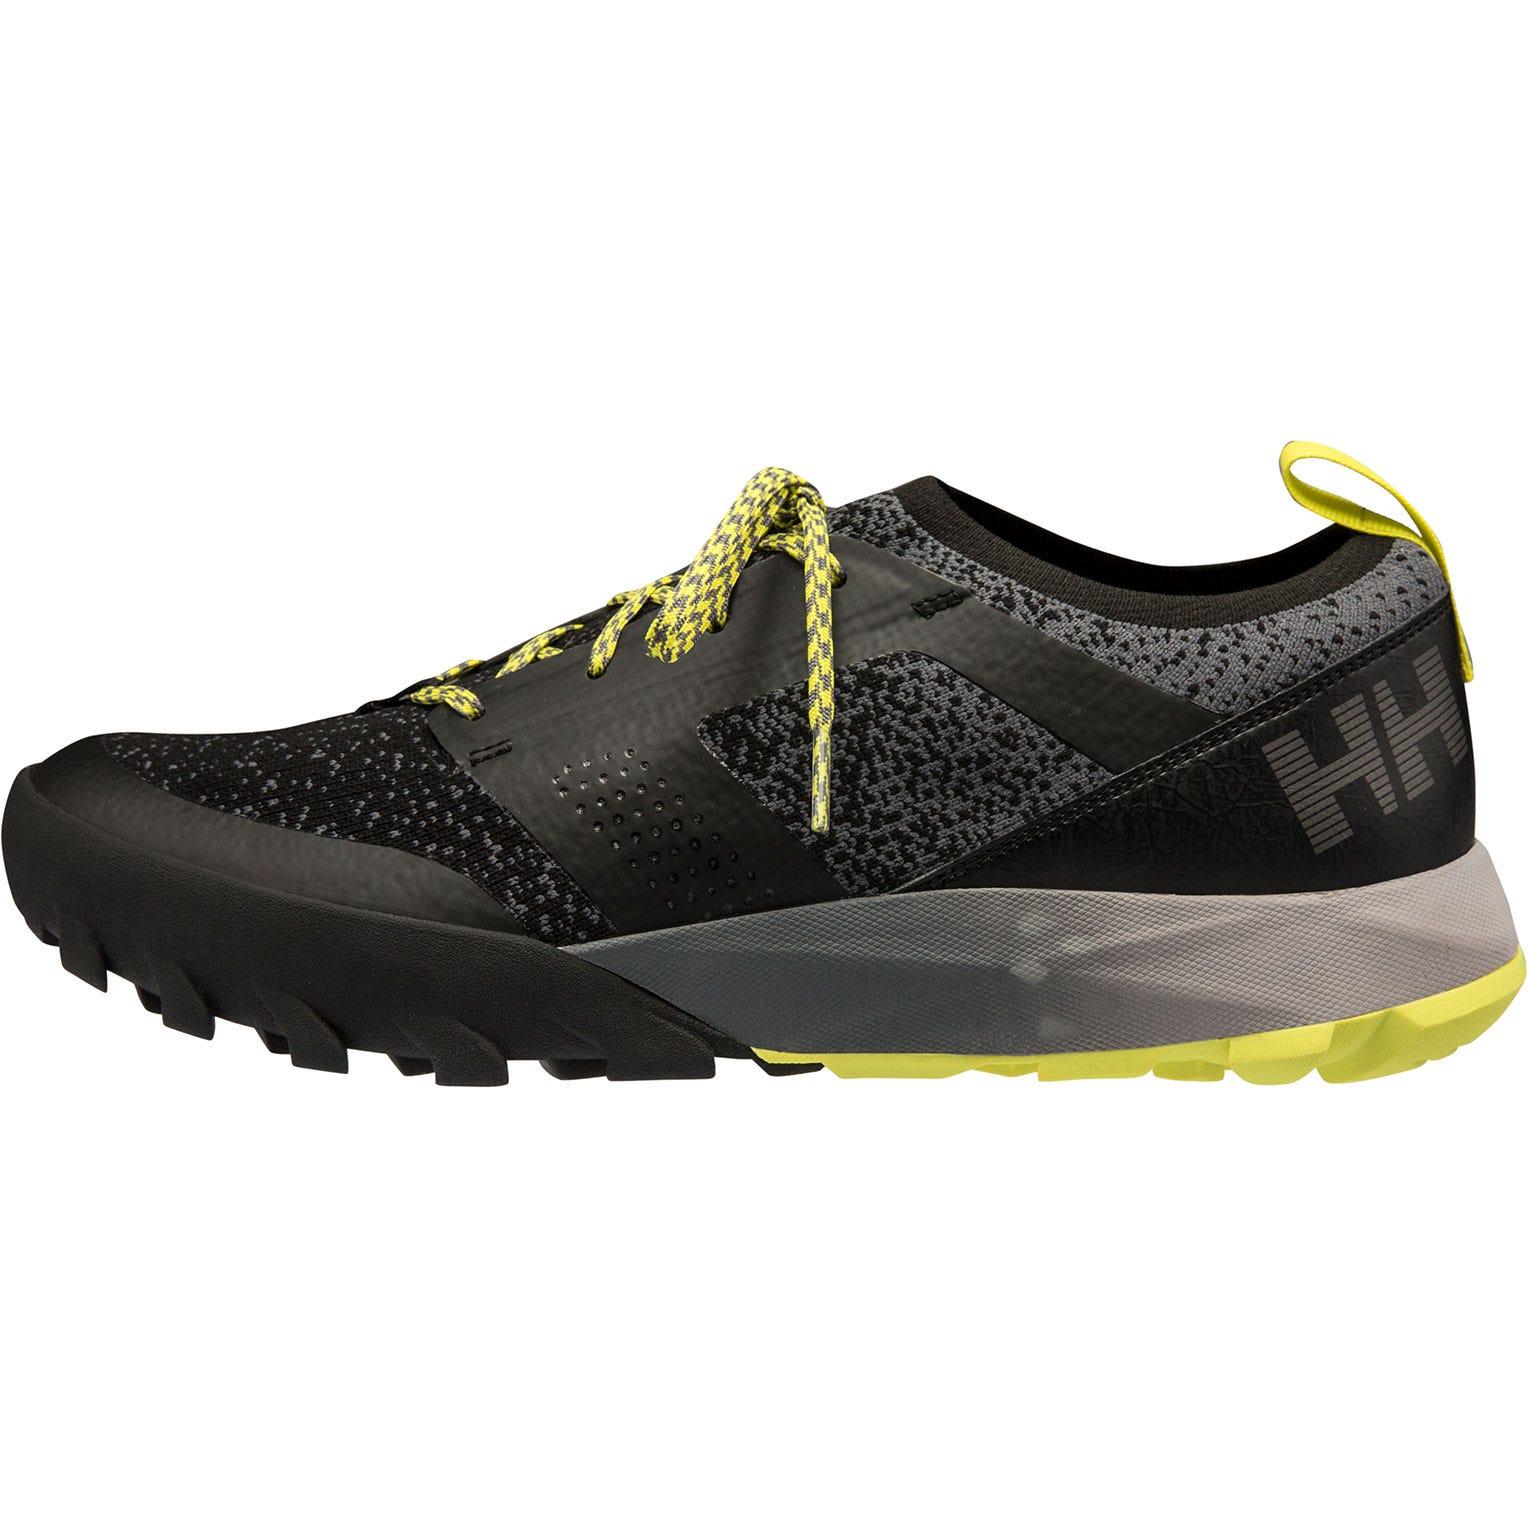 Helly Hansen Loke Dash Mens Hiking Boot Black 42.5/9